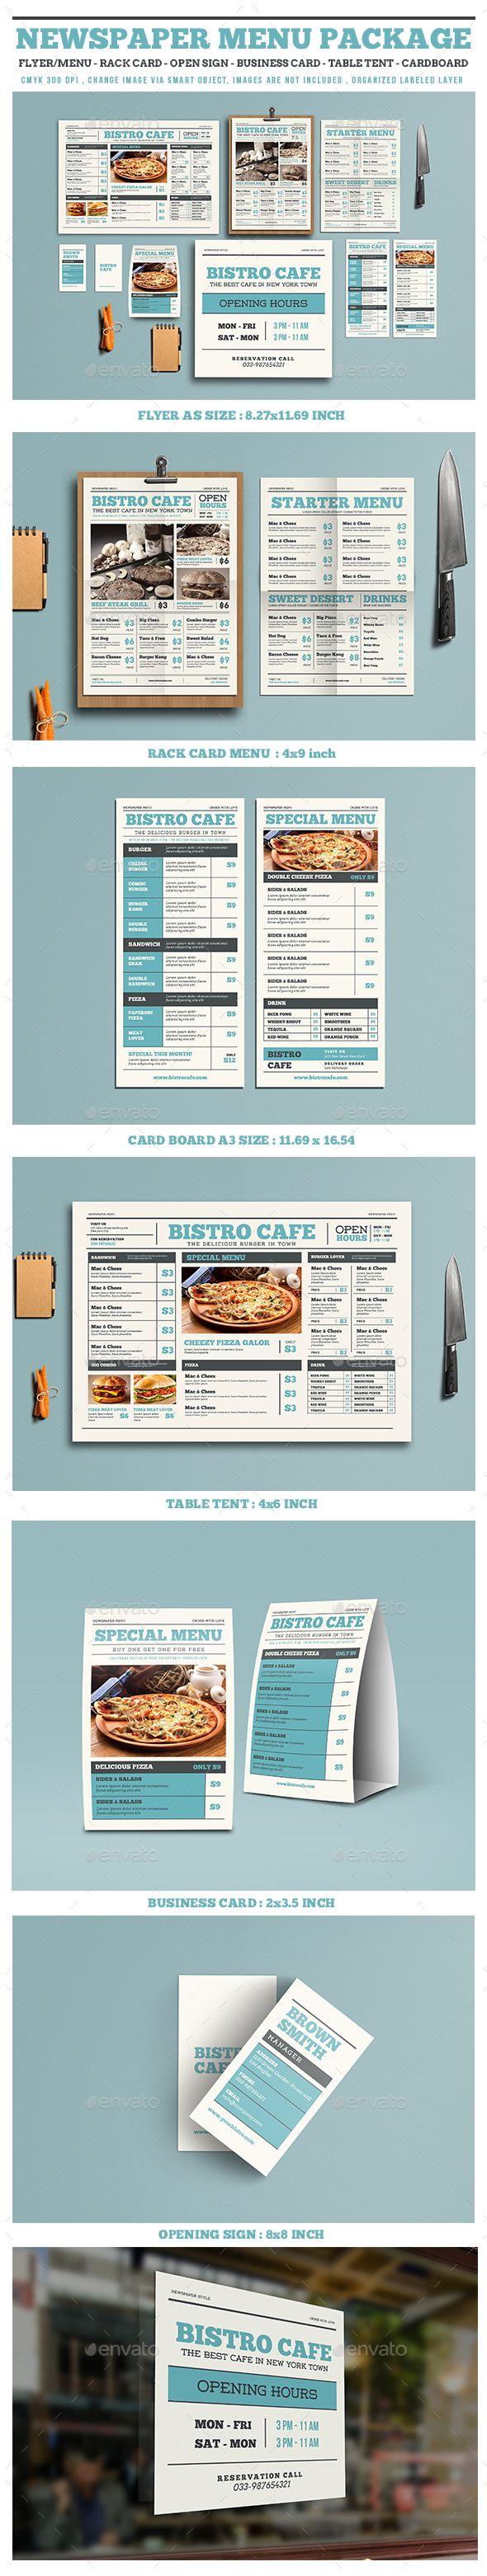 218 best DESIGN // MENU images on Pinterest | Menu layout, Page ...